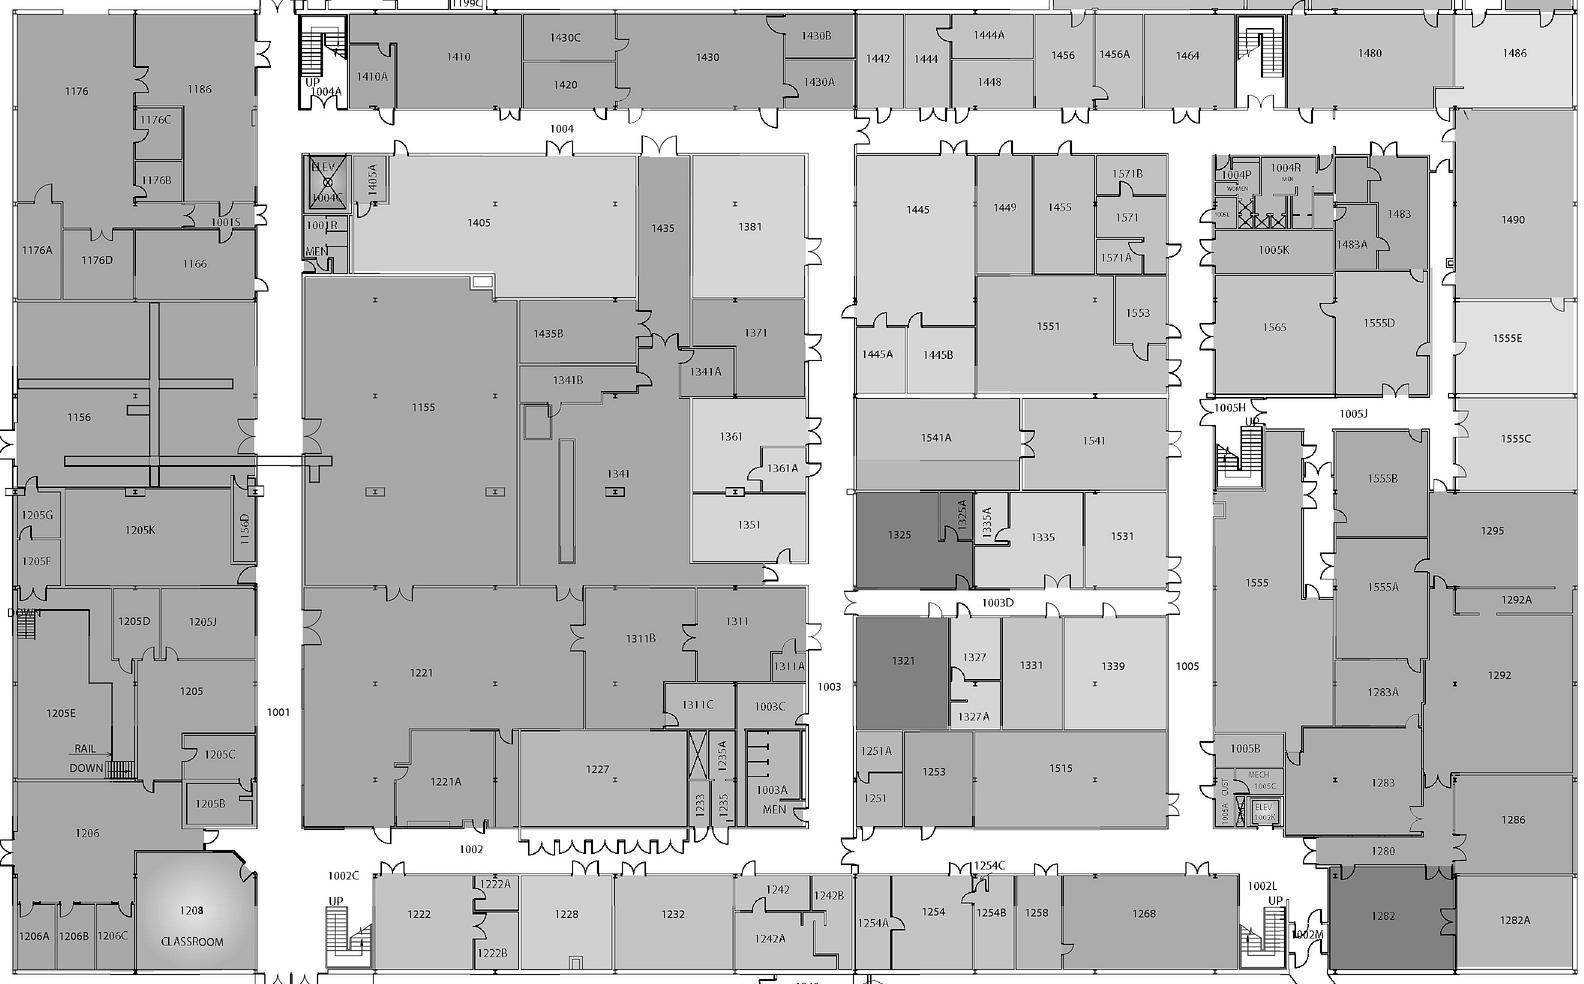 www/floormap/meb1fl-3.jpg